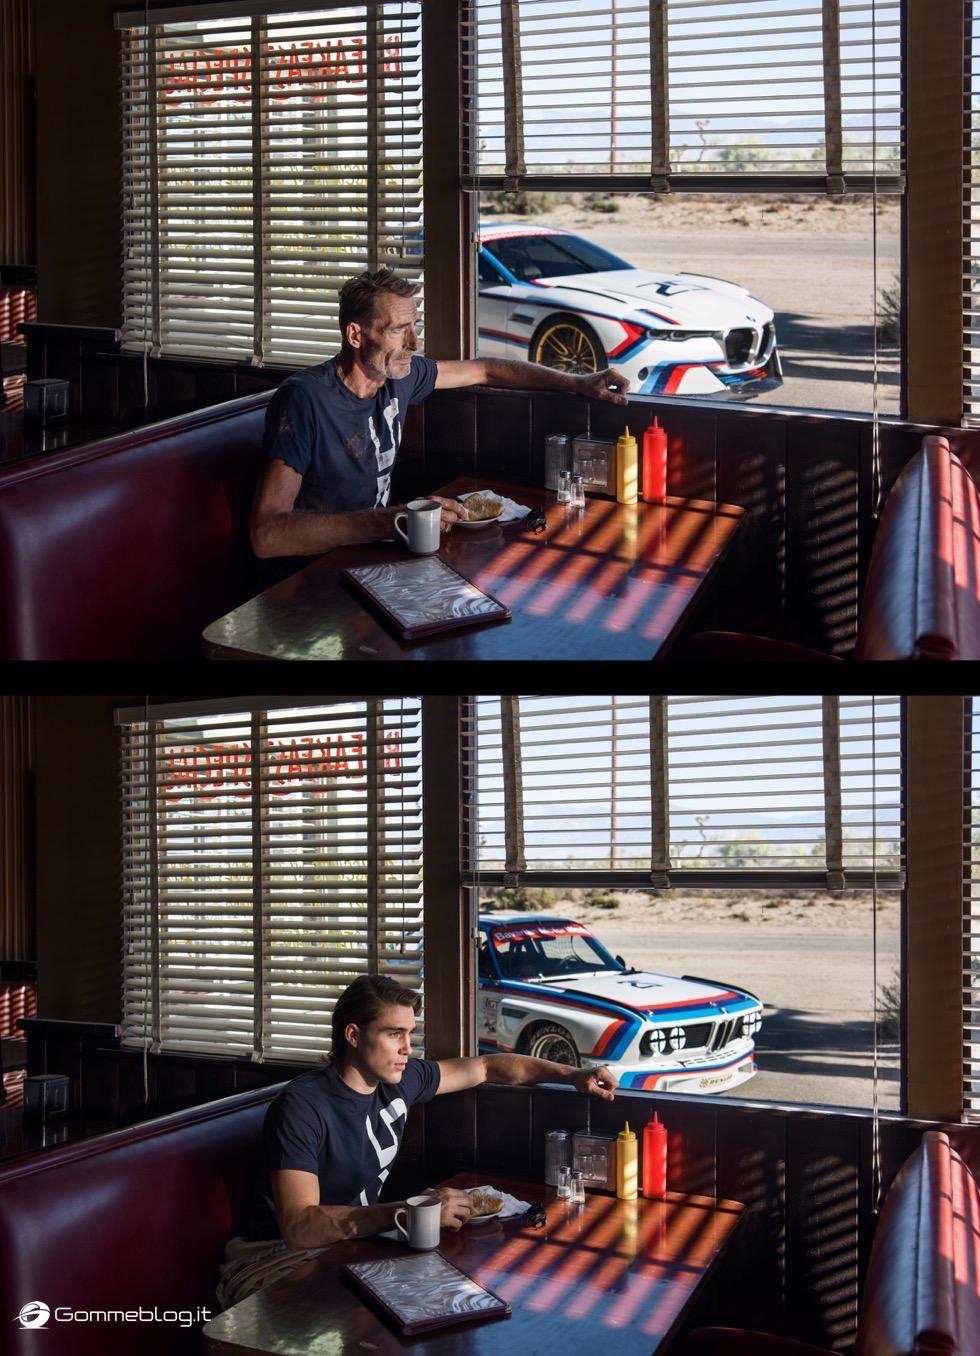 BMW 3.0 CSL Hommage R - Concorso d'Eleganza di Pebble Beach 2015 45